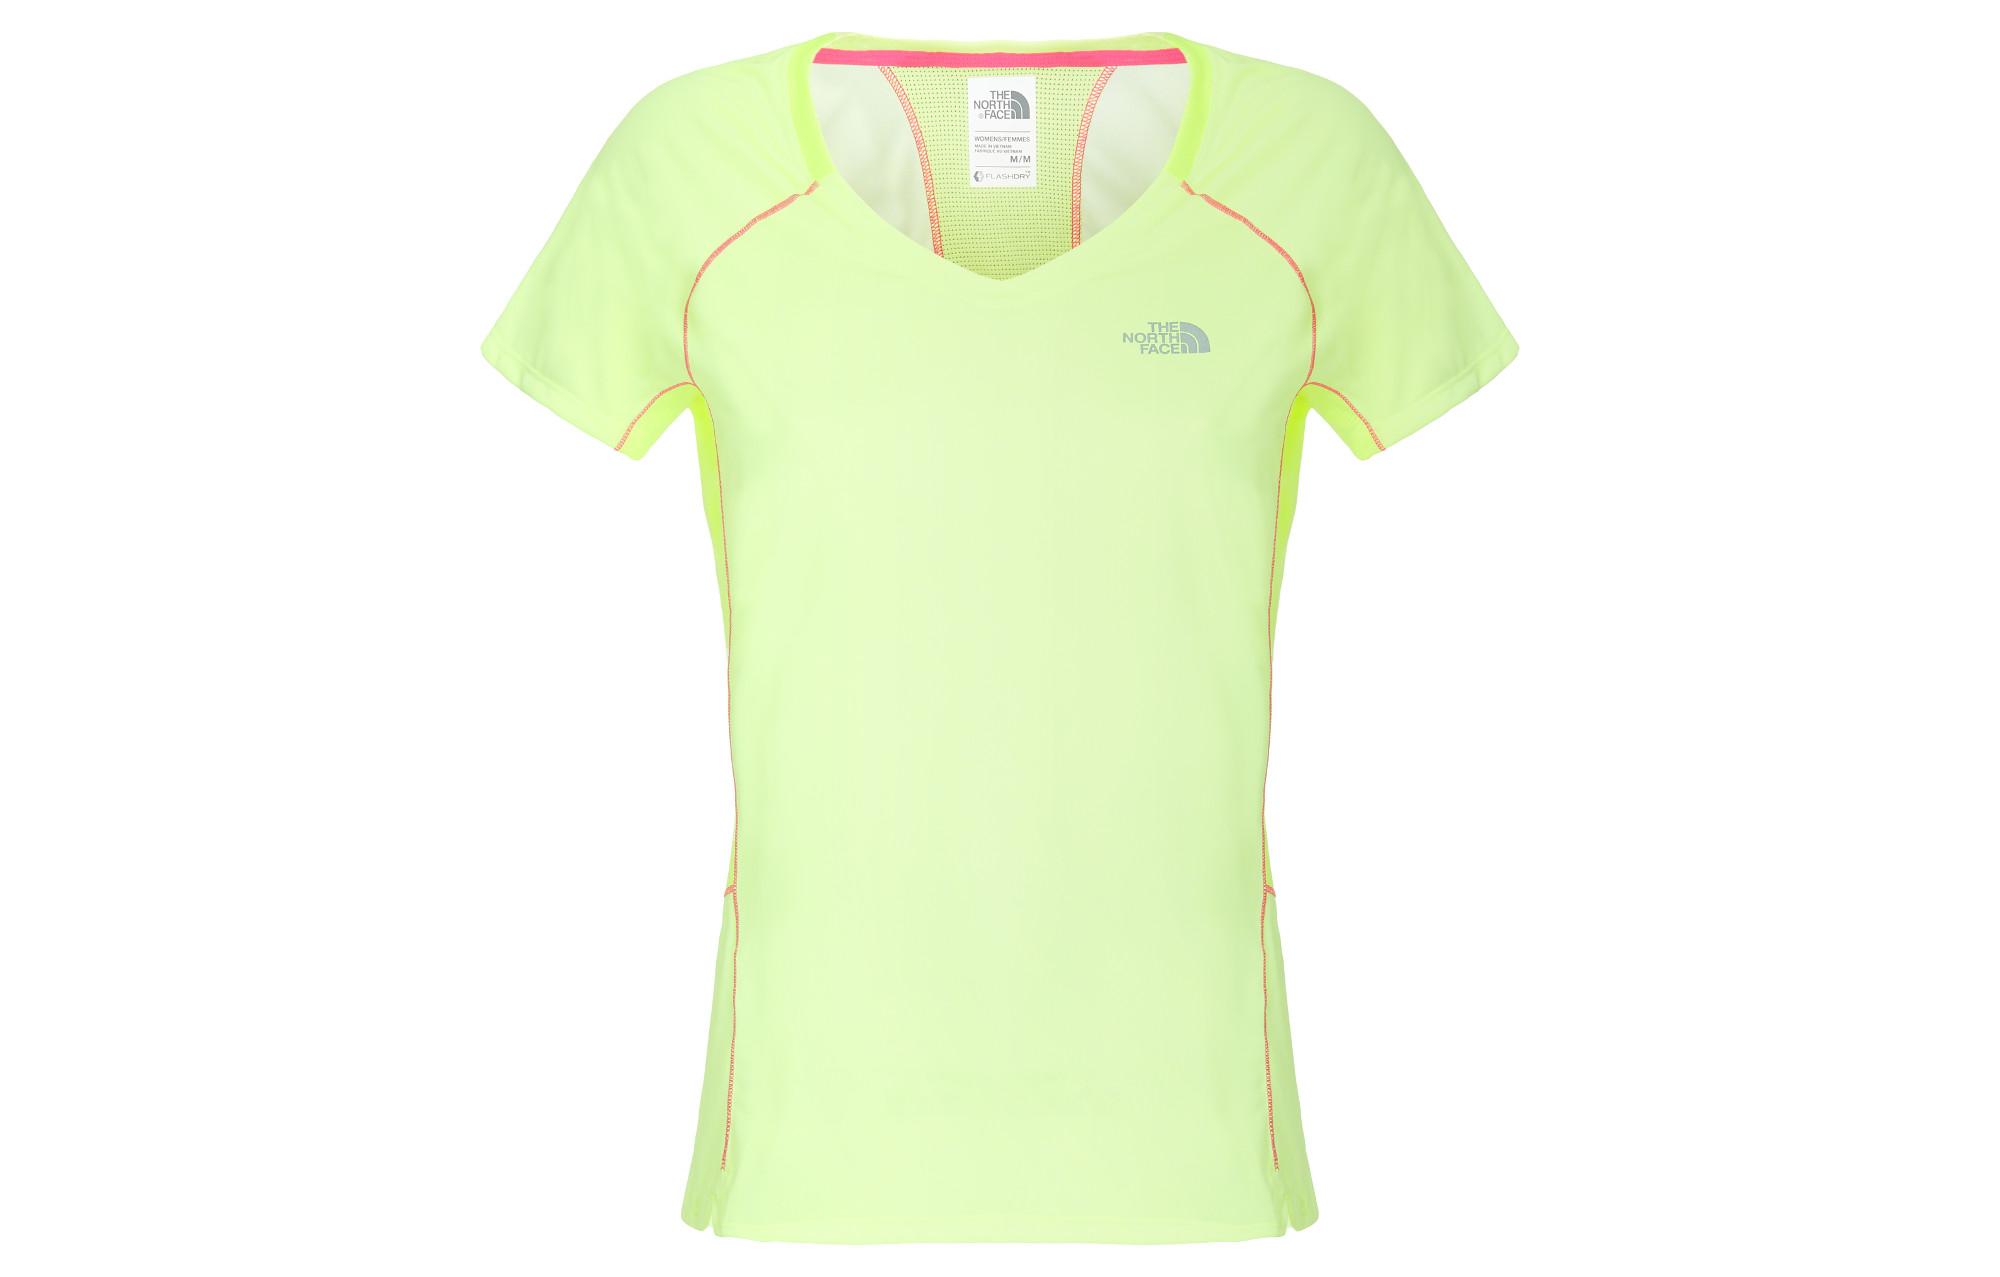 fa04ba42f41 THE NORTH FACE Shirt GTD Green Women